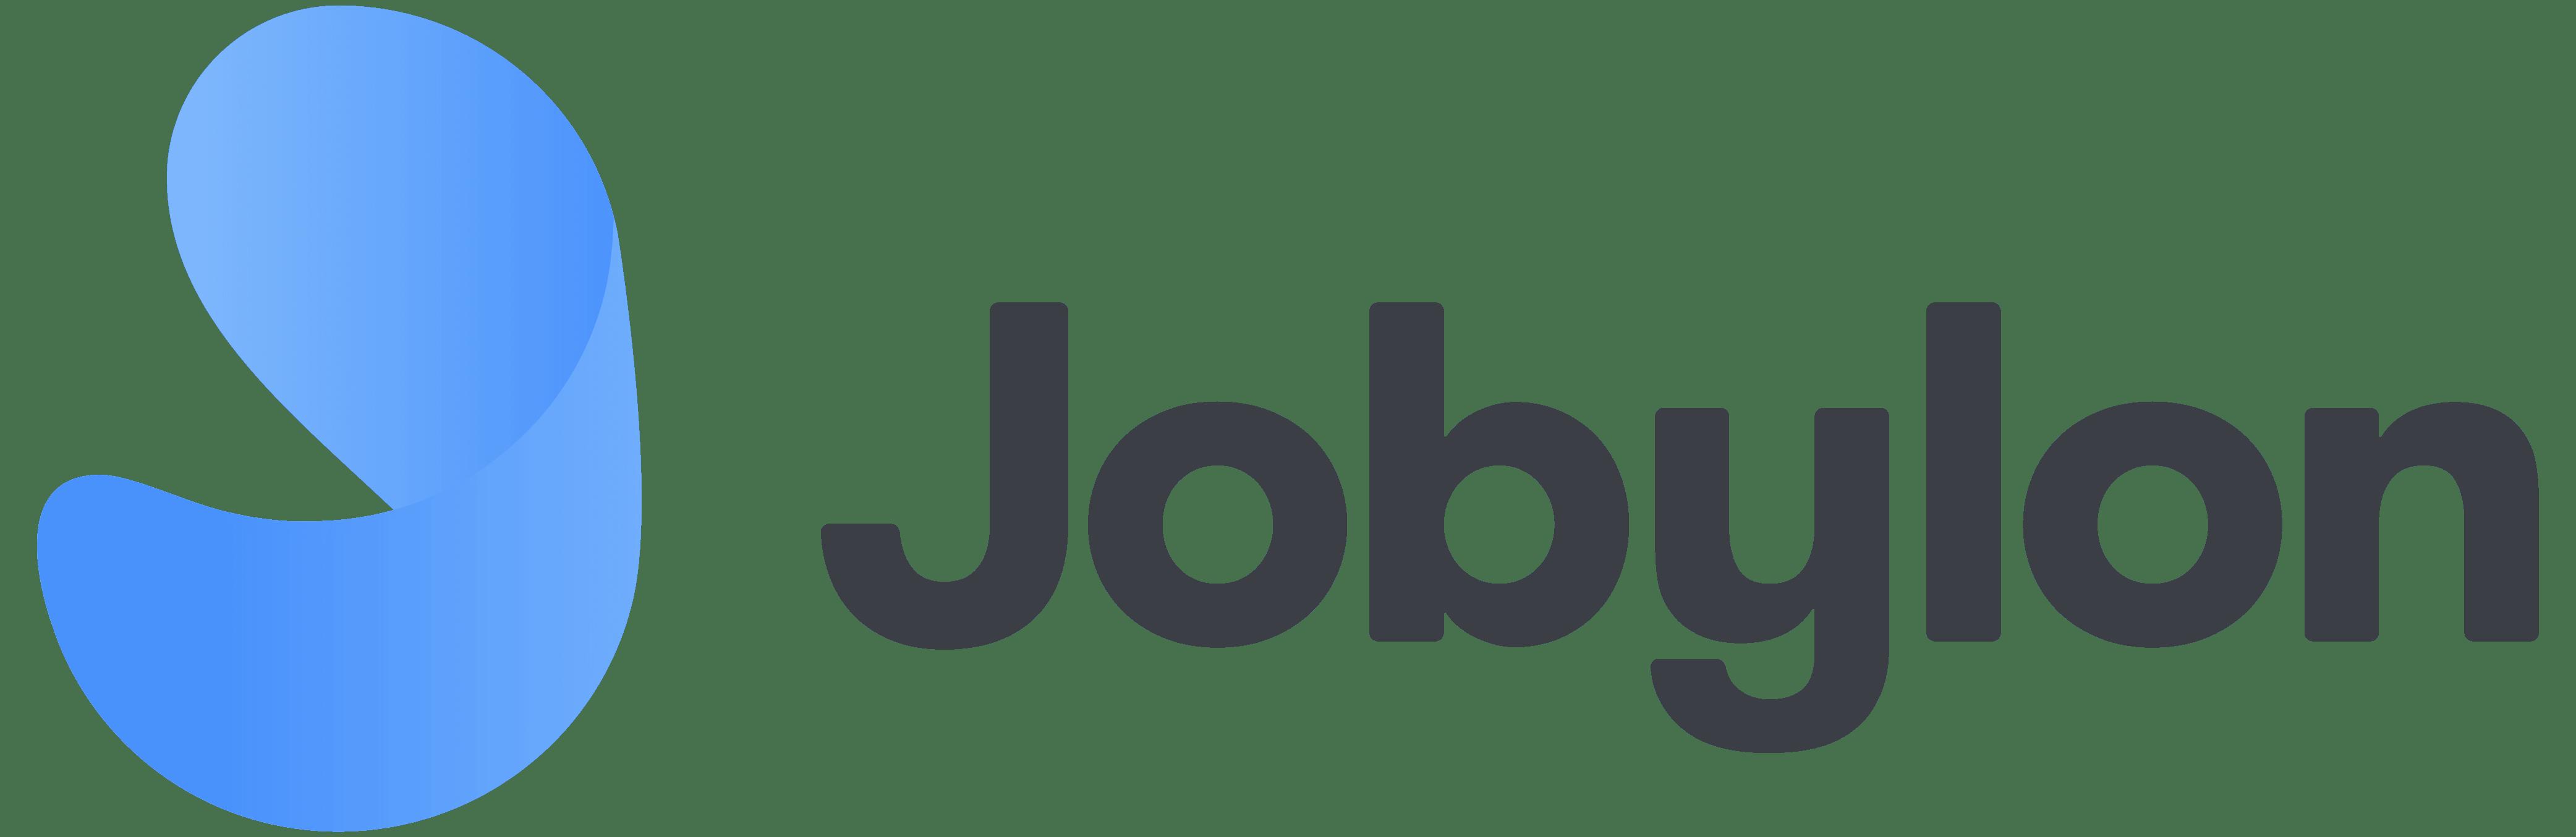 Jobylon - Colour_wordmark_RGB-1.png